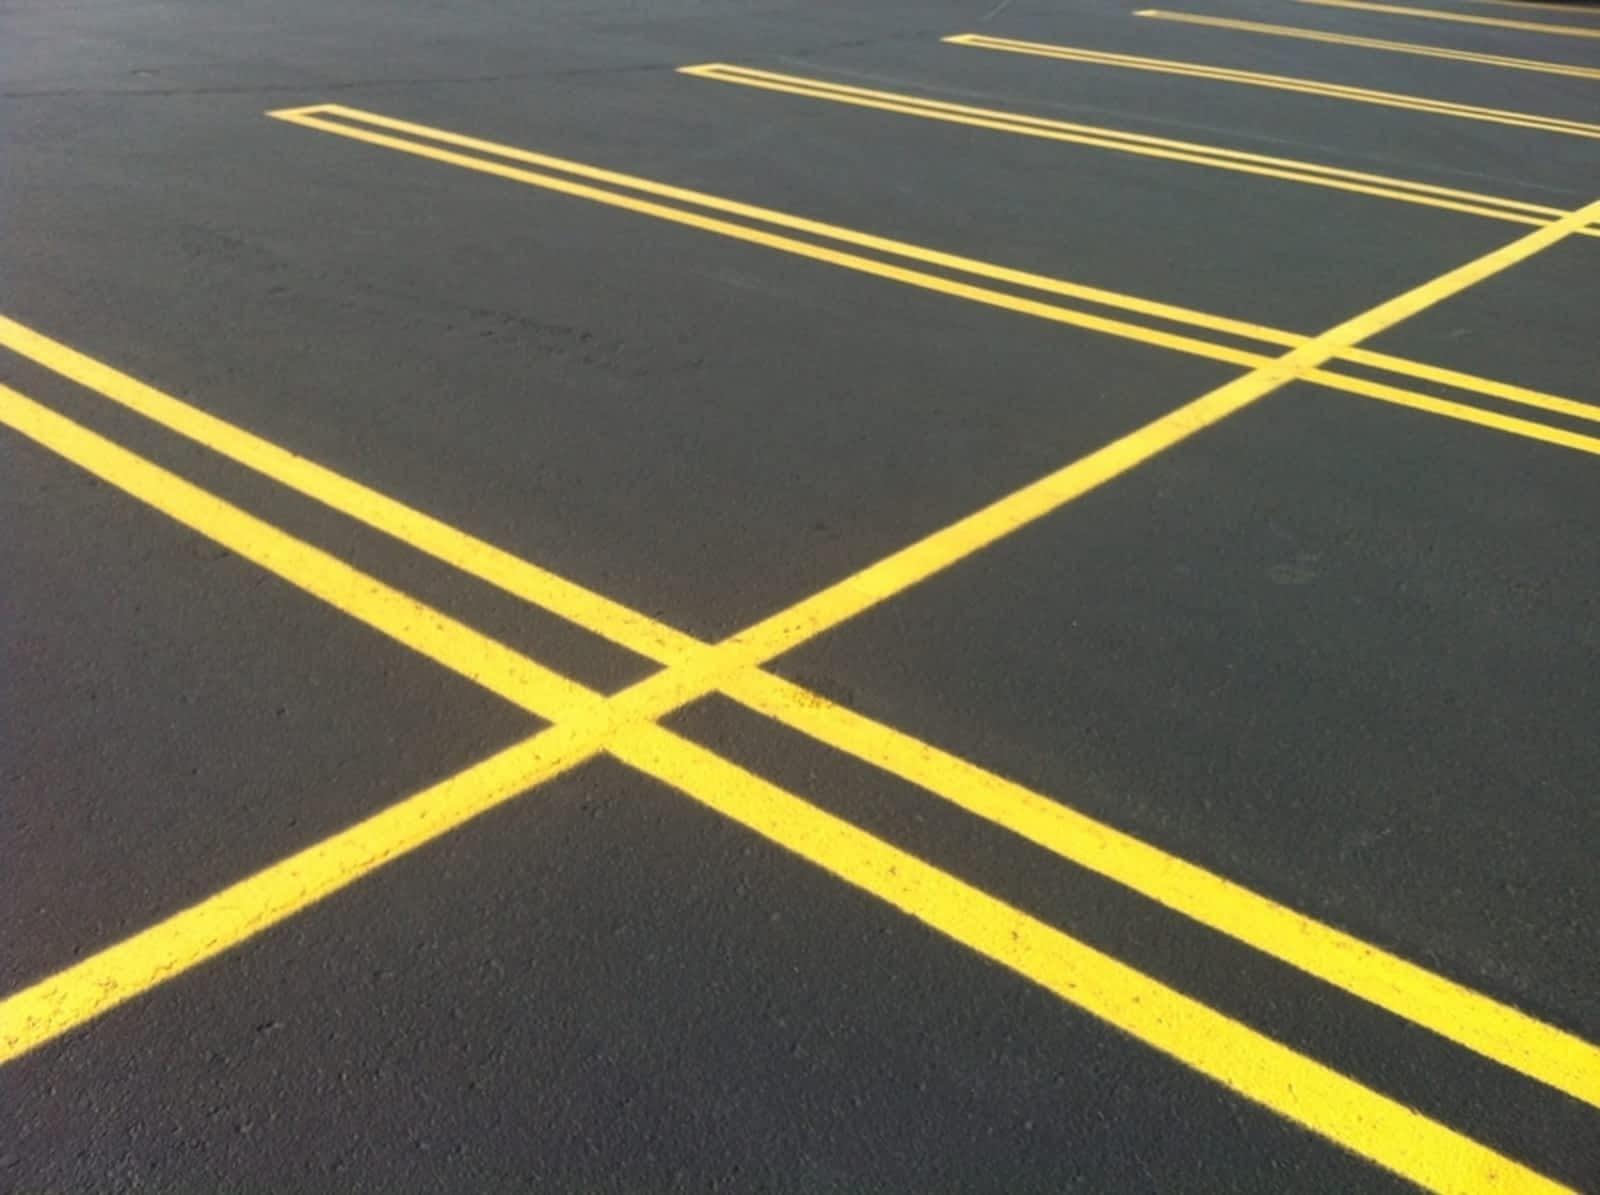 Salt Lake City Professional Lot Striping Services